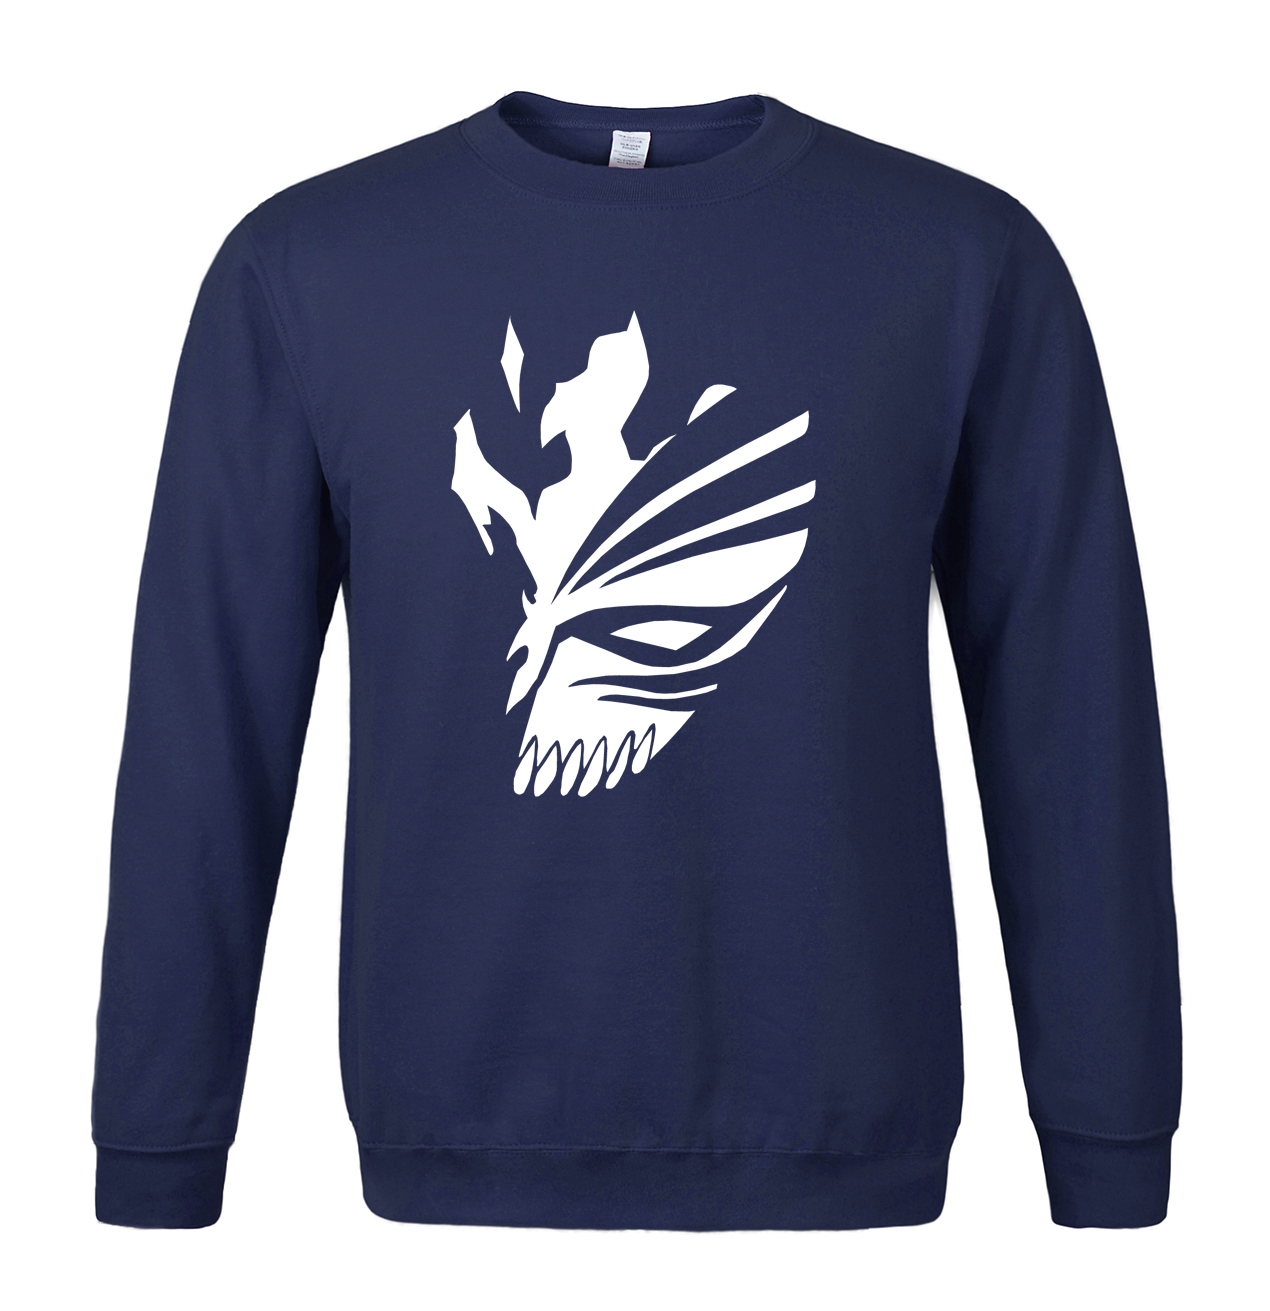 2019 sweatshirt hoodies BLEACH Kurosaki Ichigo character pattern spring winter fleece hoody Crossfit sweatshirts hip hop hoody